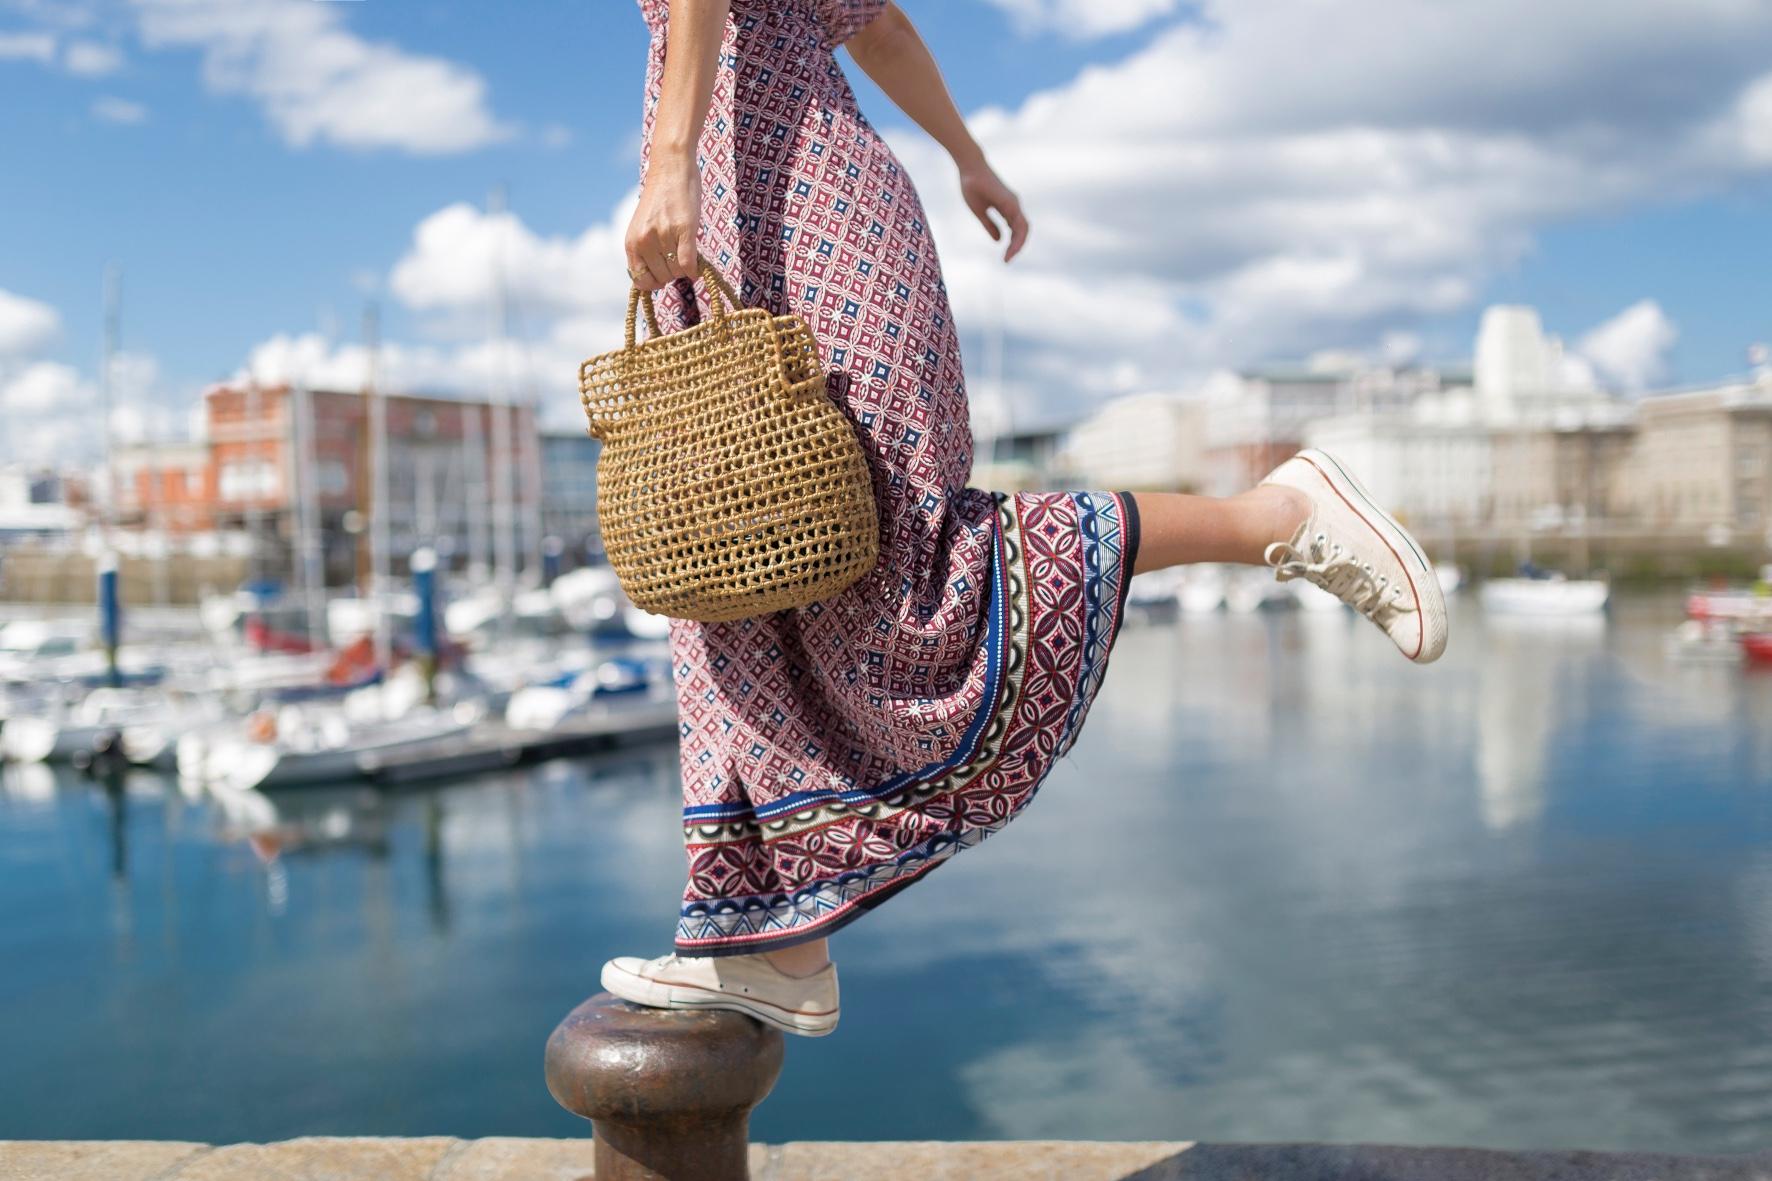 fashion-moda-blogger- alba cuesta-C&A dress- bolso de mimbre- vestido largo- C and A- descalzaporelparque